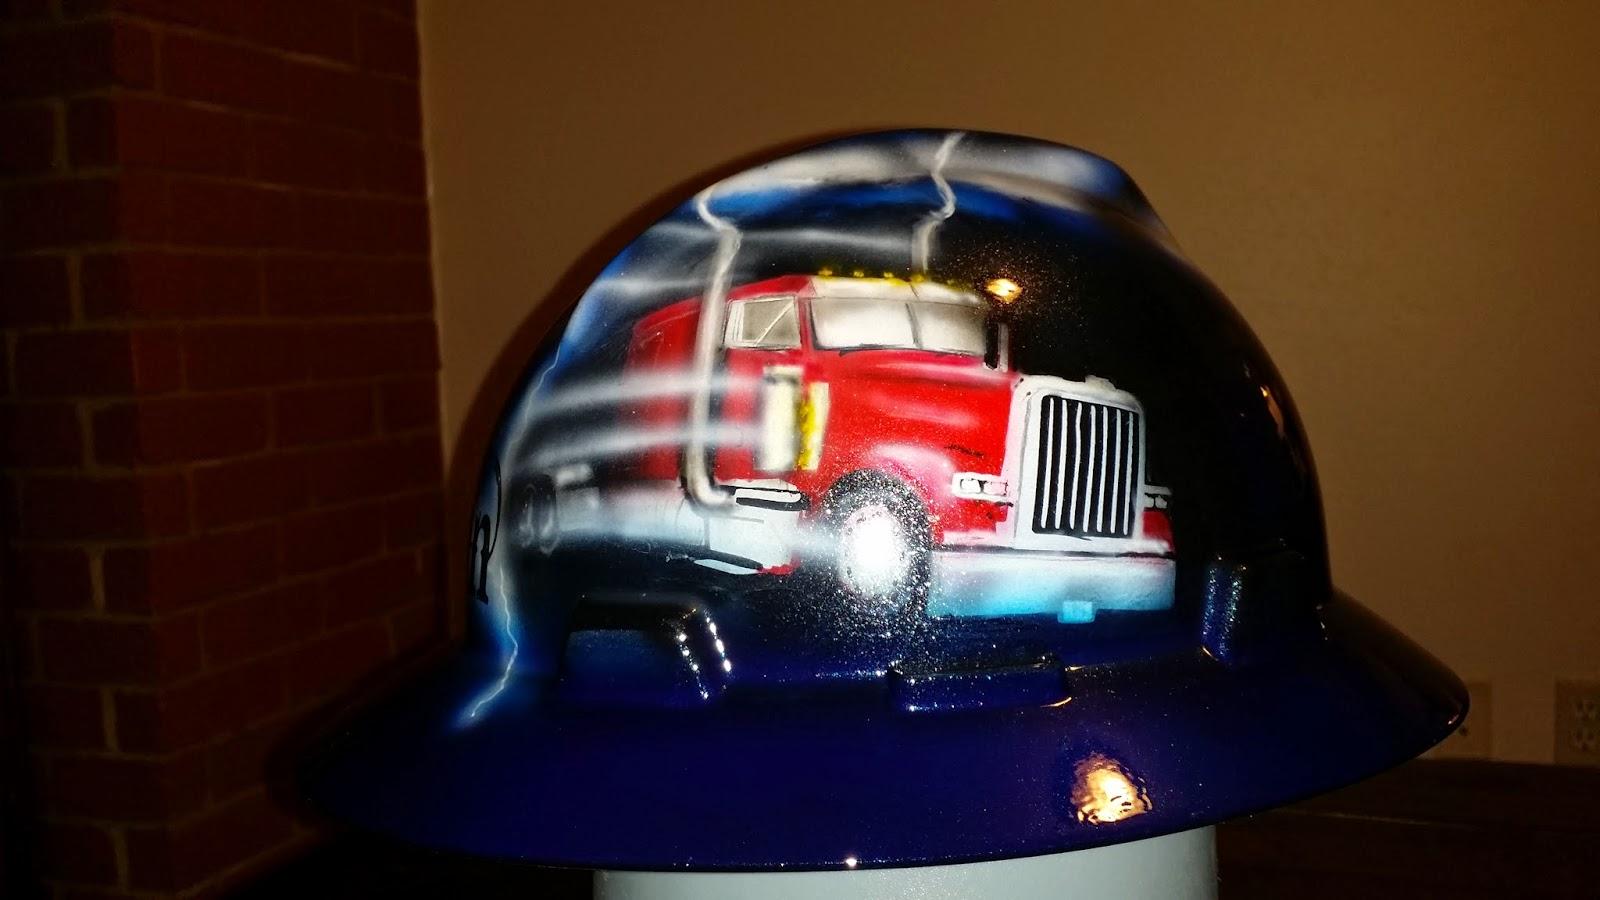 Cool hard hat design with Peterbilt truck